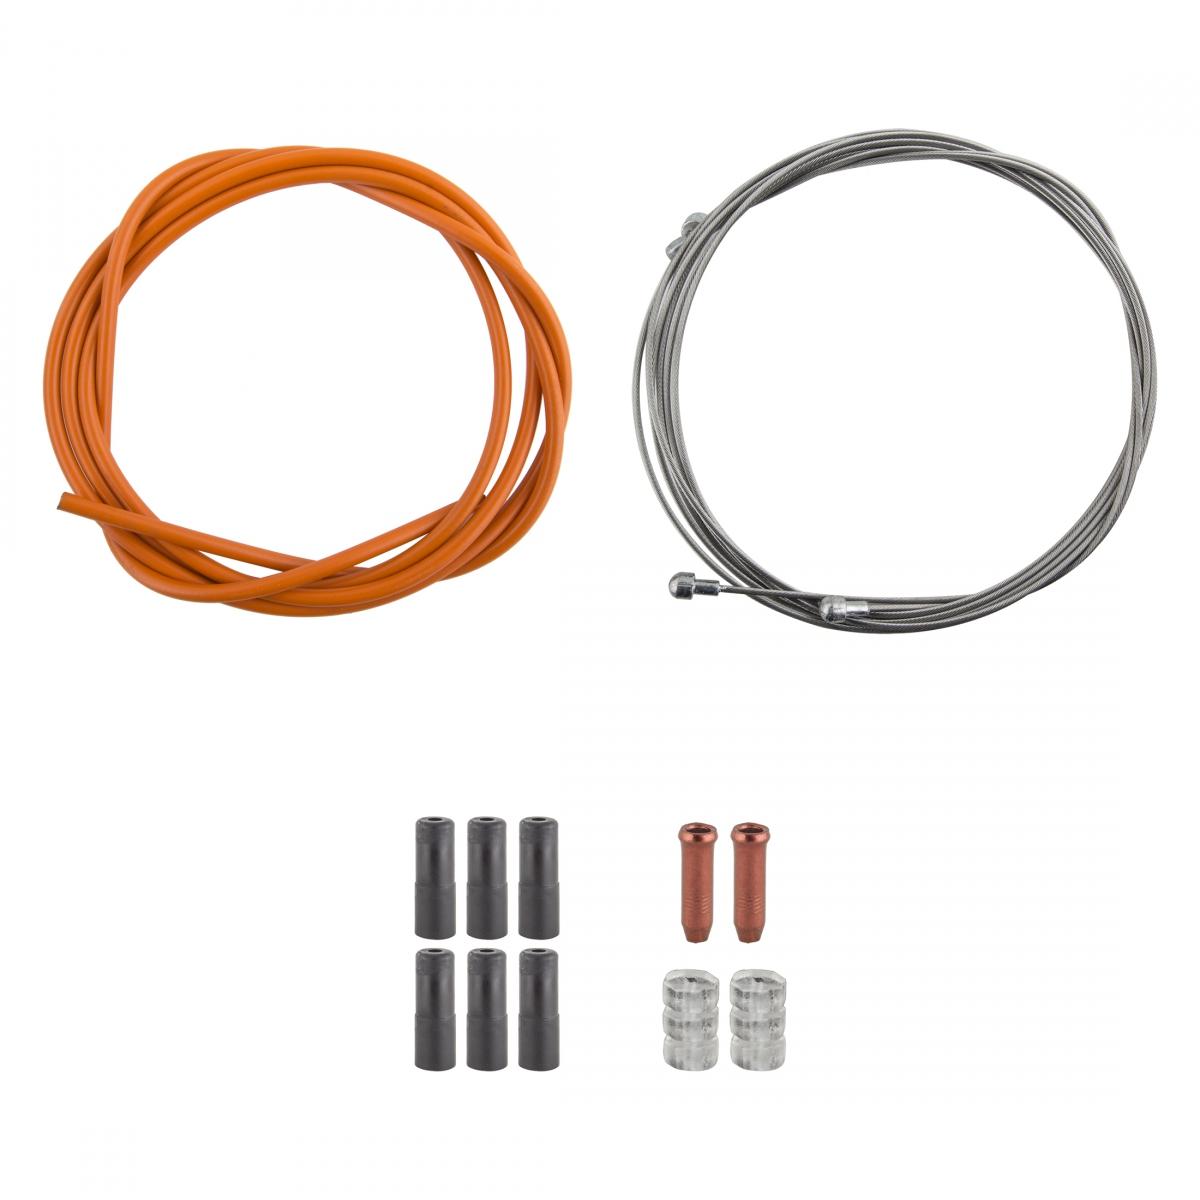 Sunlite Cable Brake 1.5X2000 Ss Slick Univ